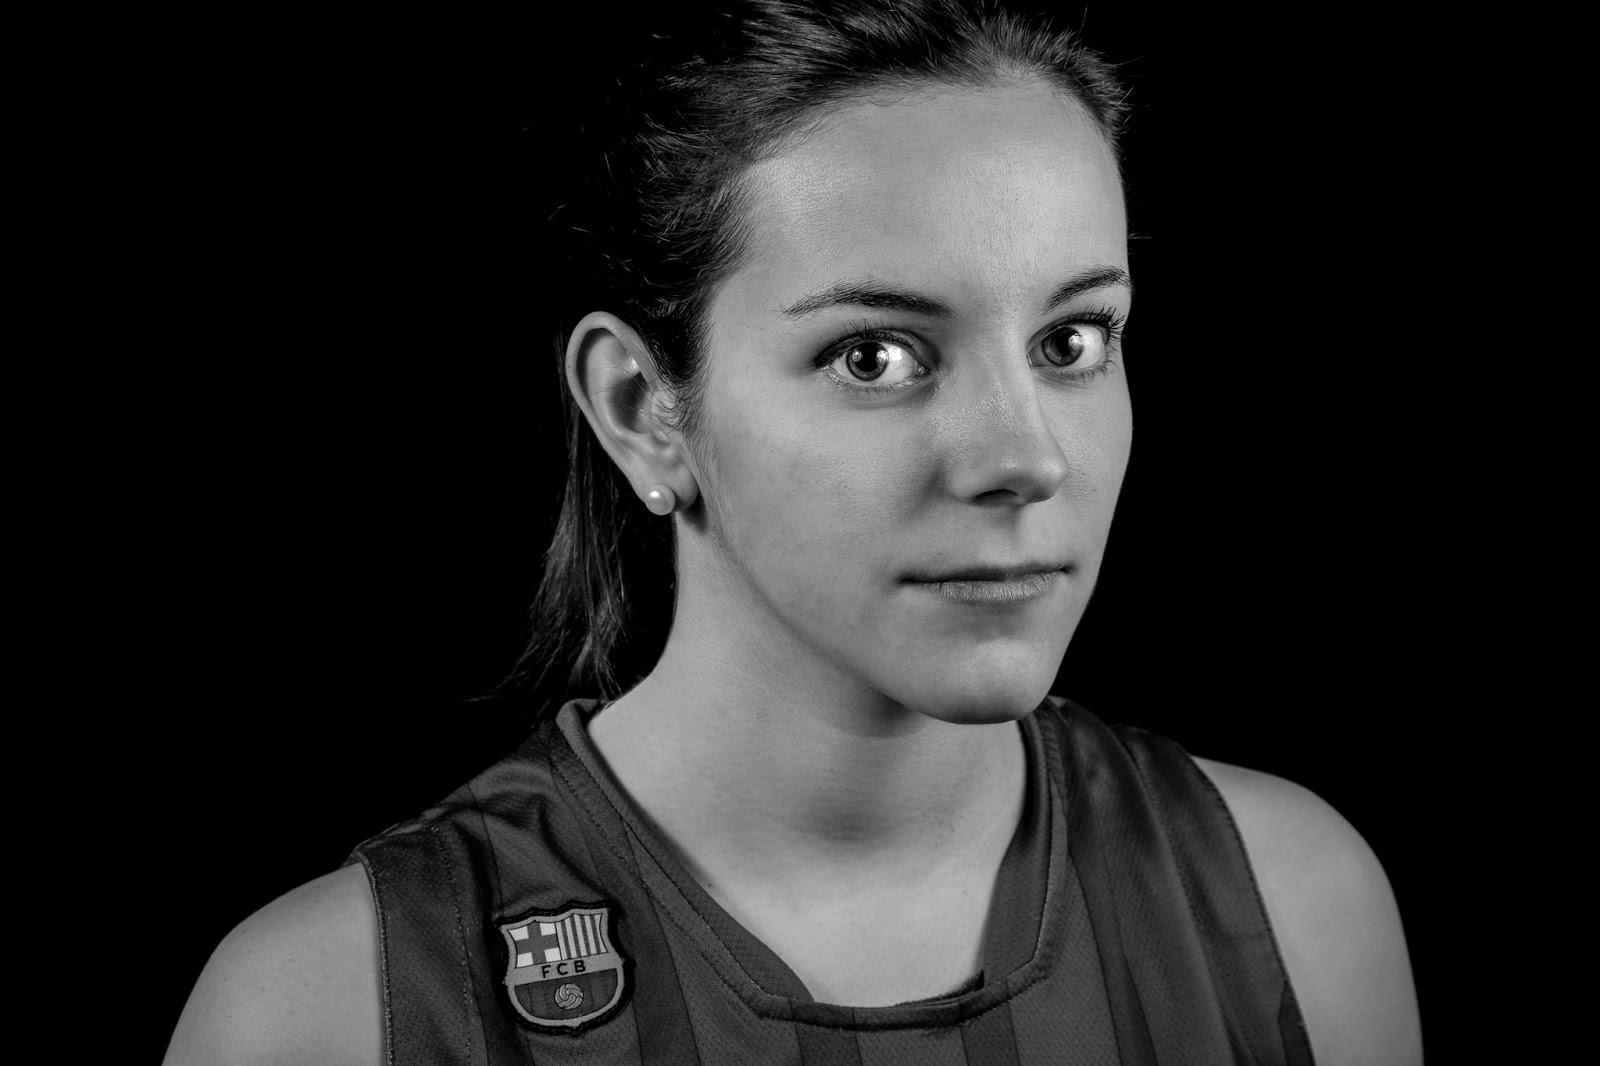 Xènia 05 - CBS Barça Senior Femenino A - 2013 :: Canon EOS 5D MkIII | ISO100 | Canon 24-105 @60mm | f/11 | 1/60s